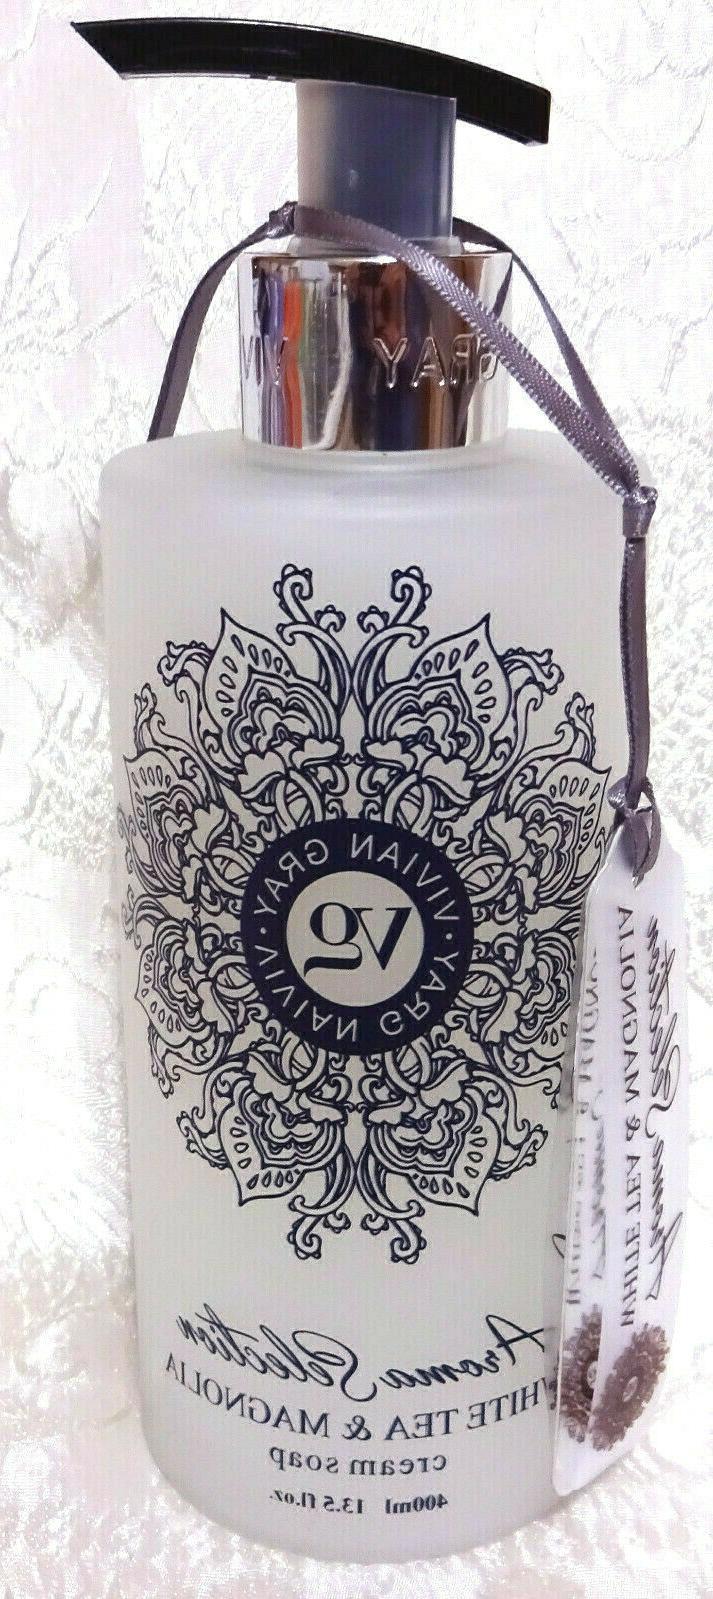 Vivian Gray WHITE TEA & MAGNOLIA Cream Hand Soap 13.5 in Germany 2